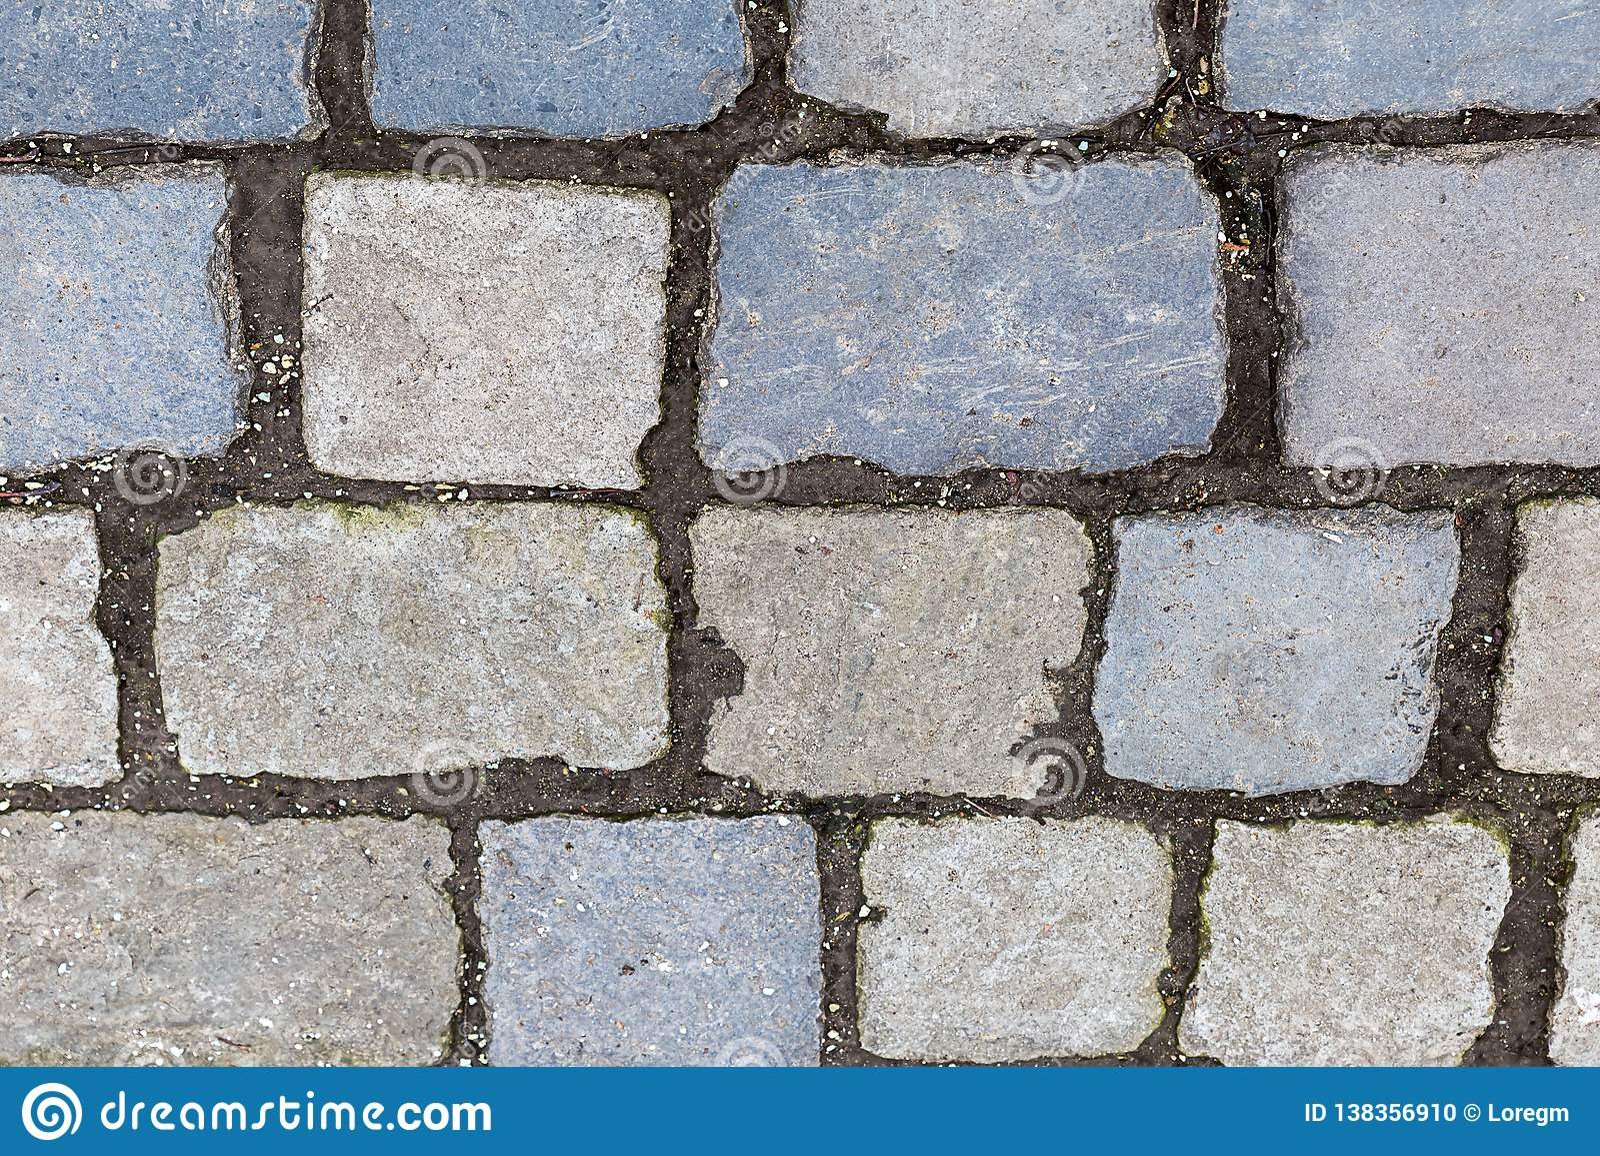 Stone Surface Many Cobblestone Lines Cement Rectangular